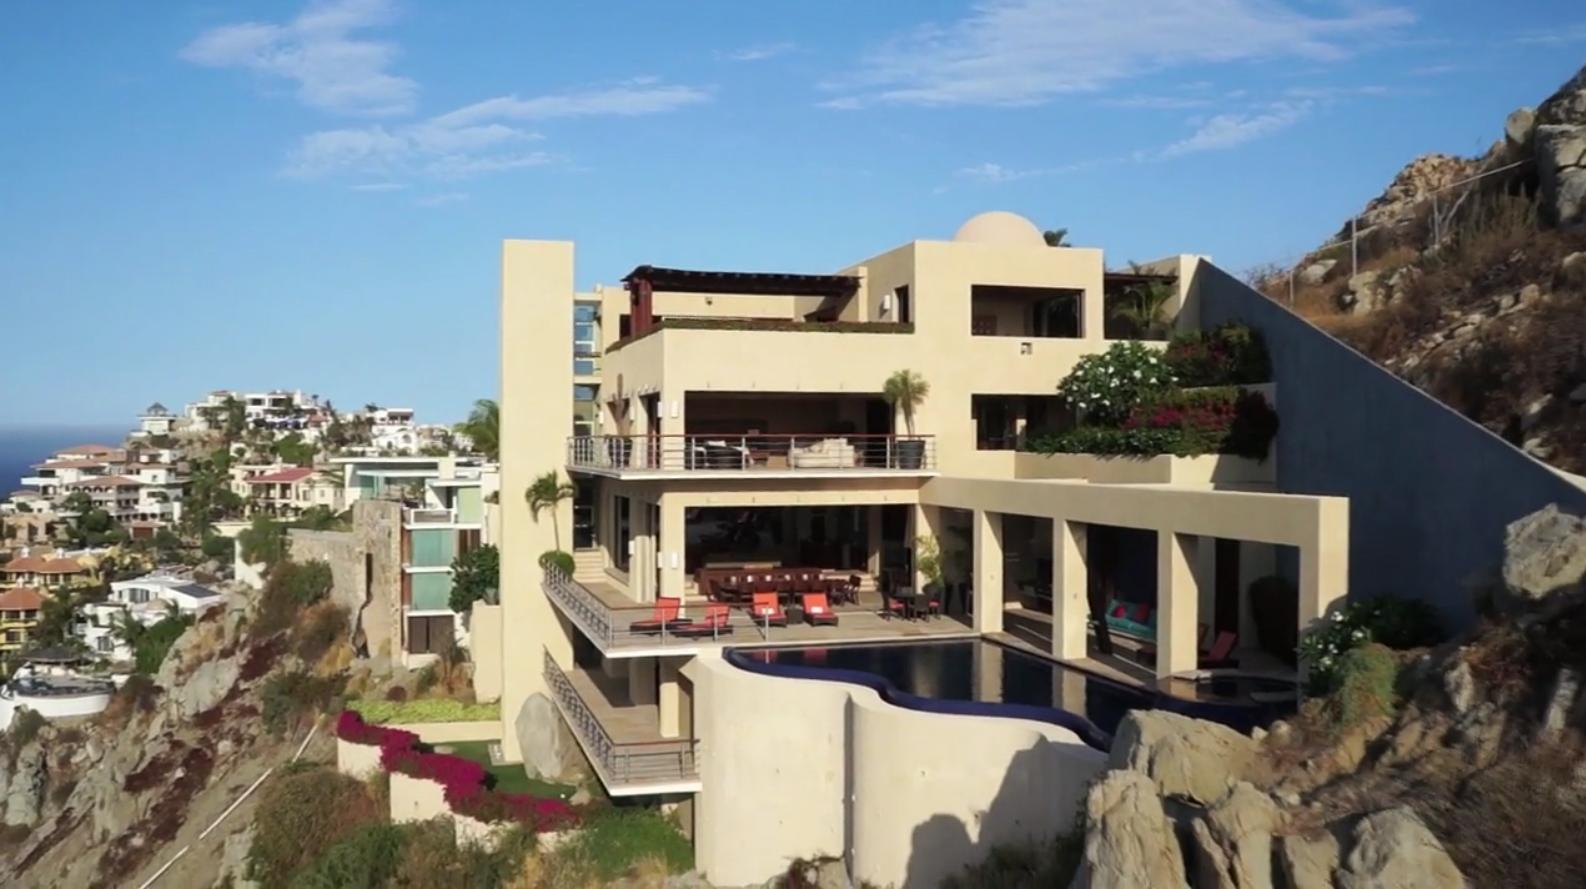 Villa Bellissima - Pedregal Community of Cabo San Lucas